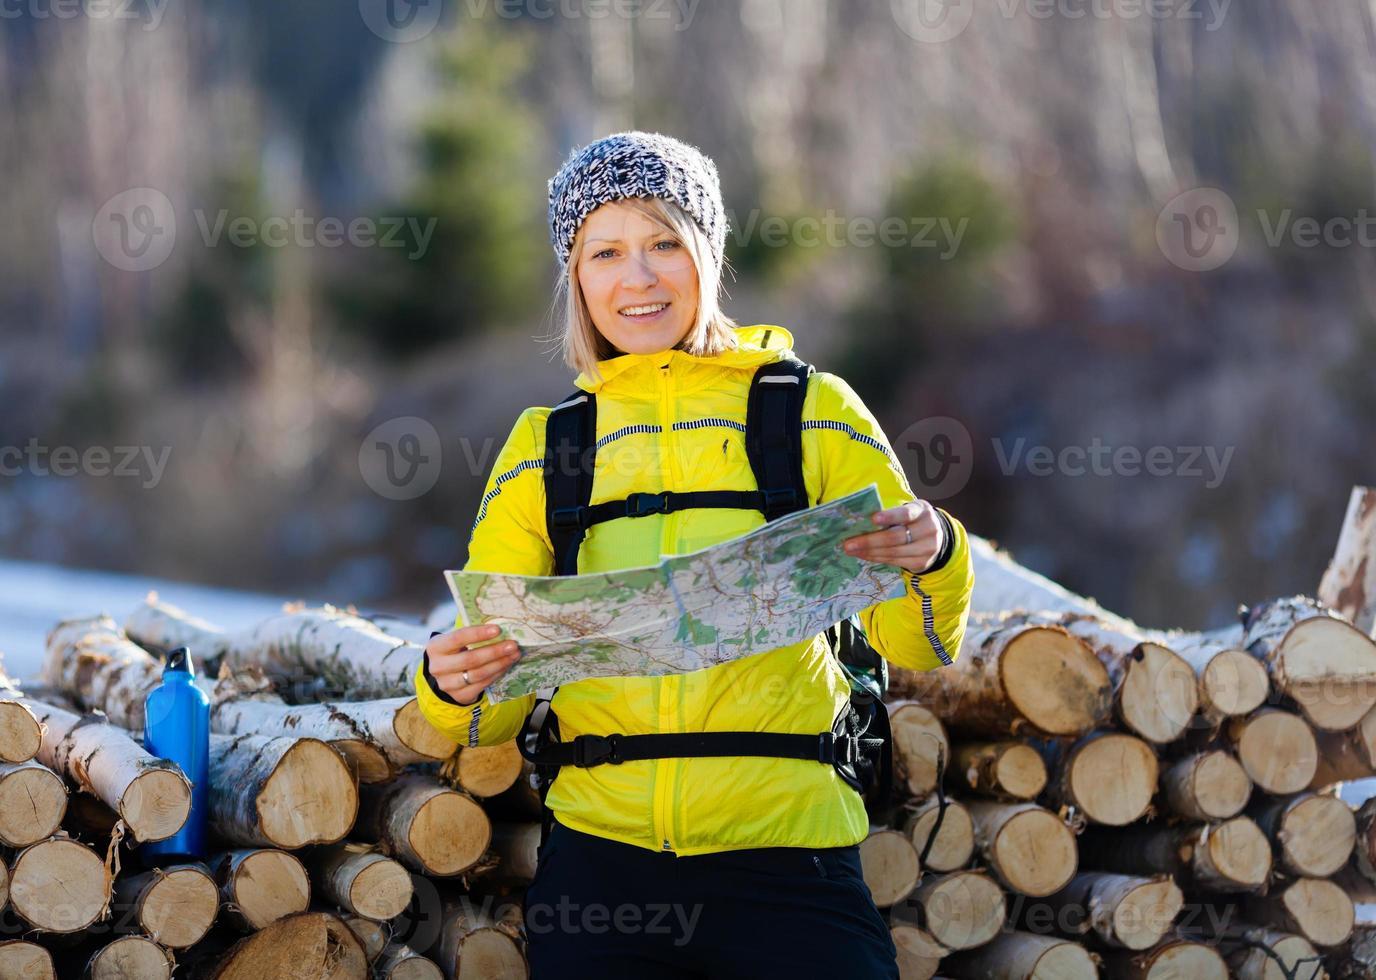 Frau, die im Winterwald wandert und kampiert foto